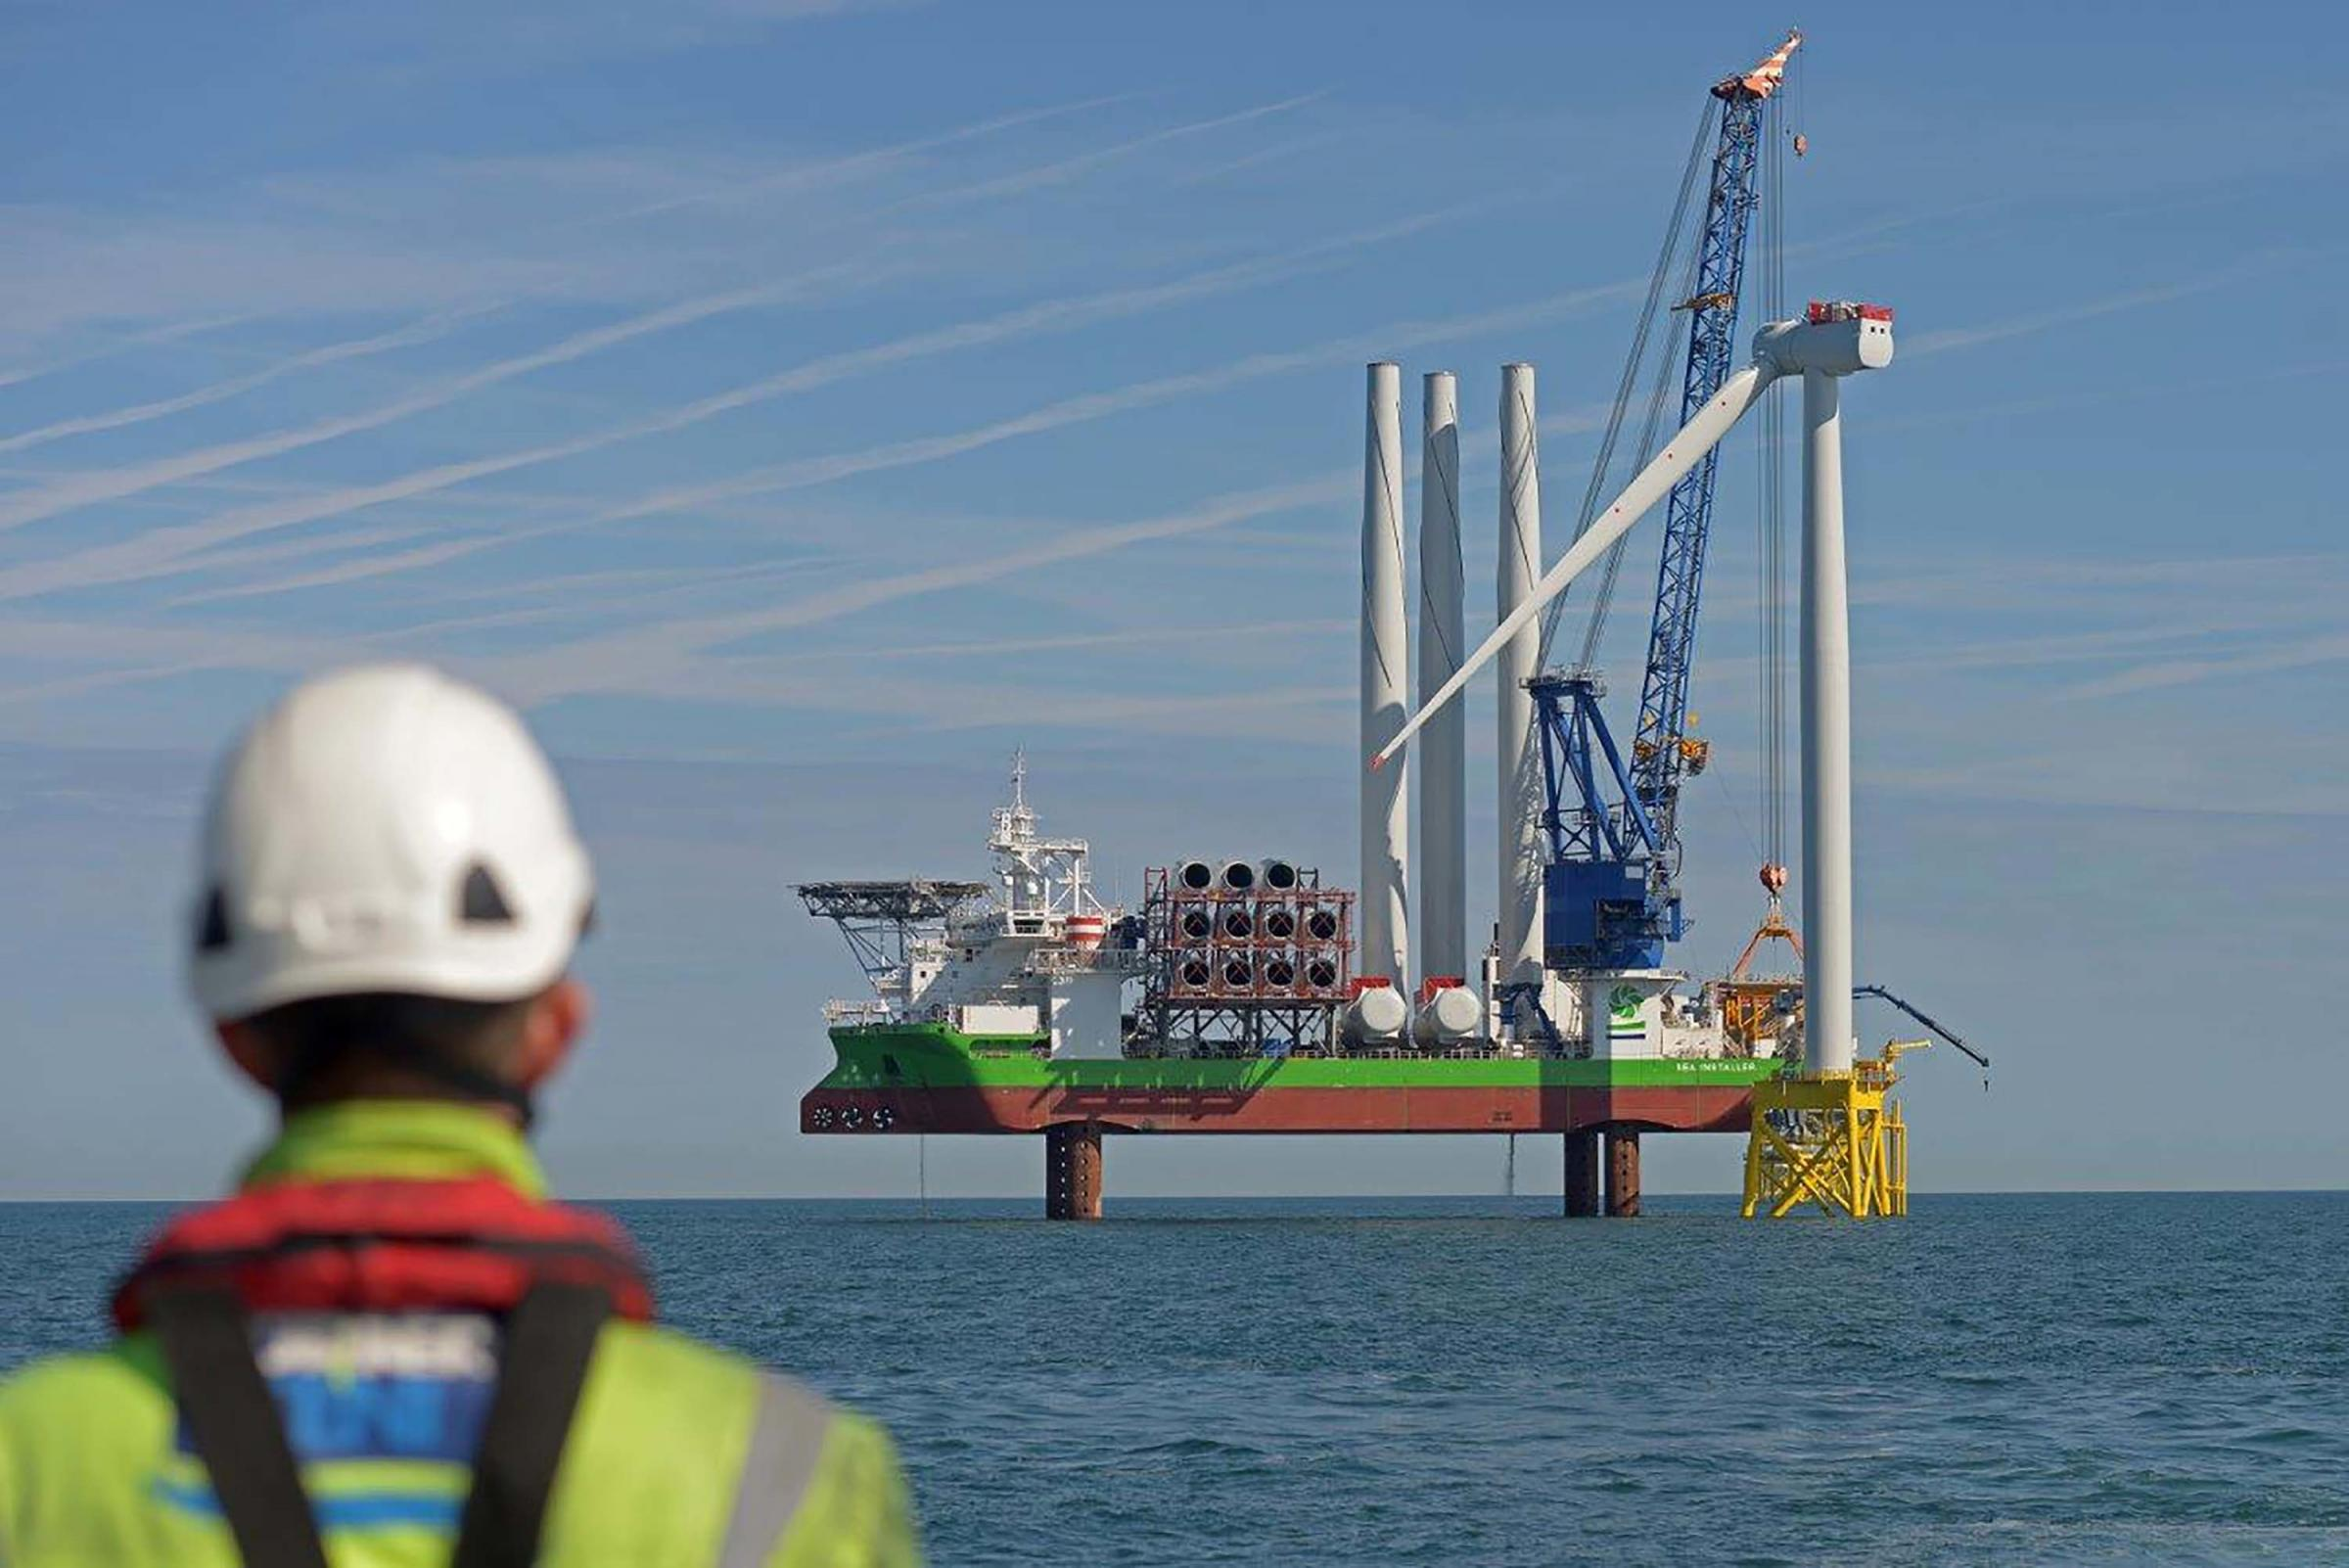 £1.6bn windfarm deal boost for North Sea